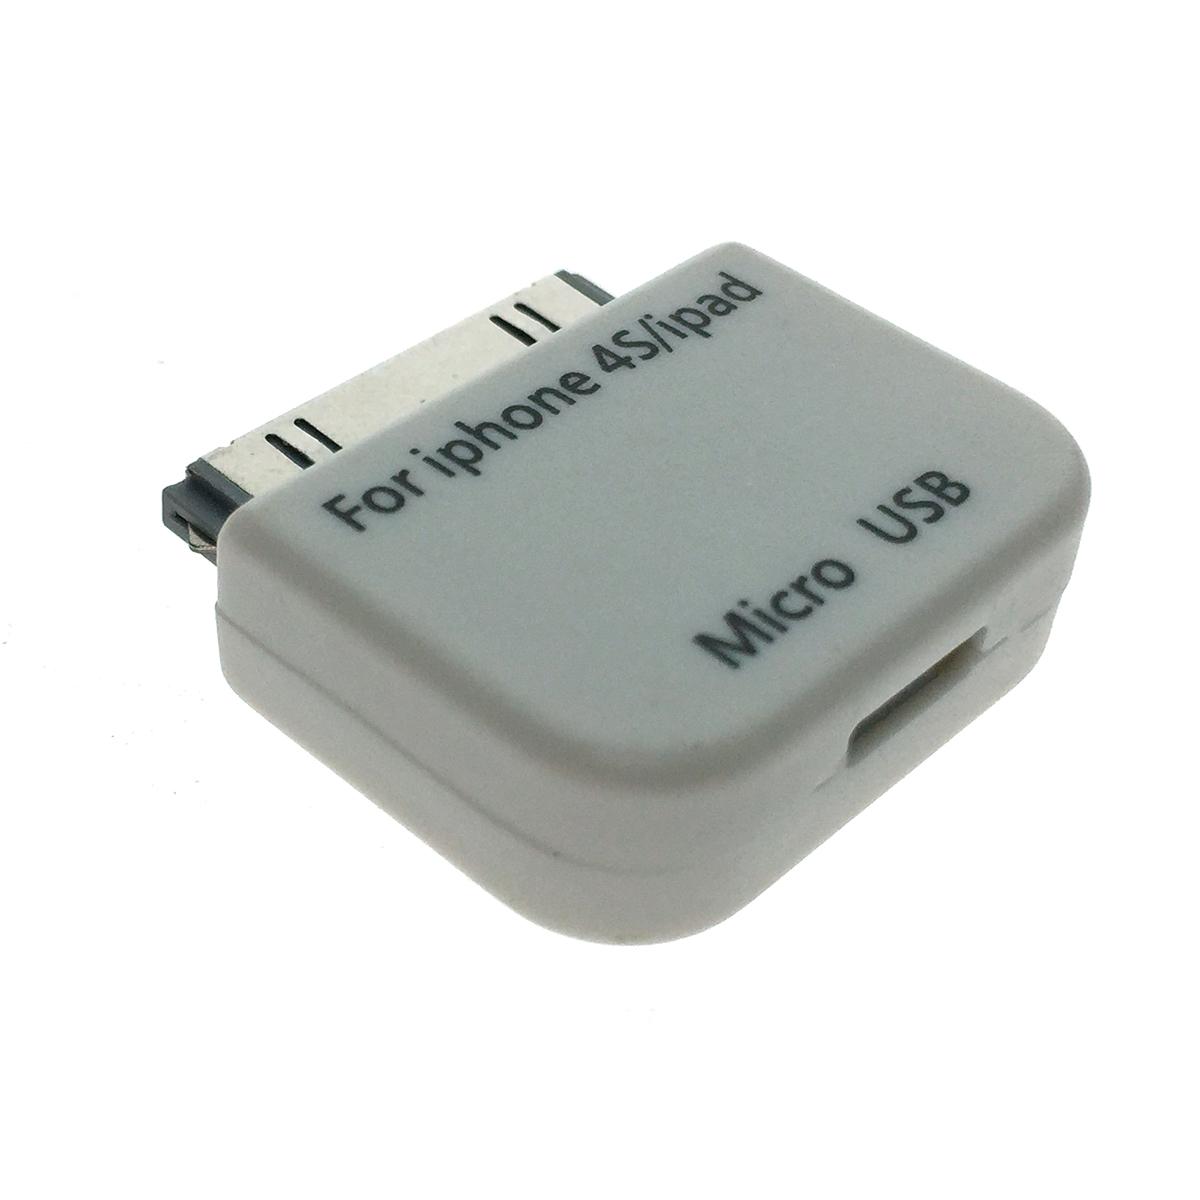 Переходник Espada 30 pin to micro